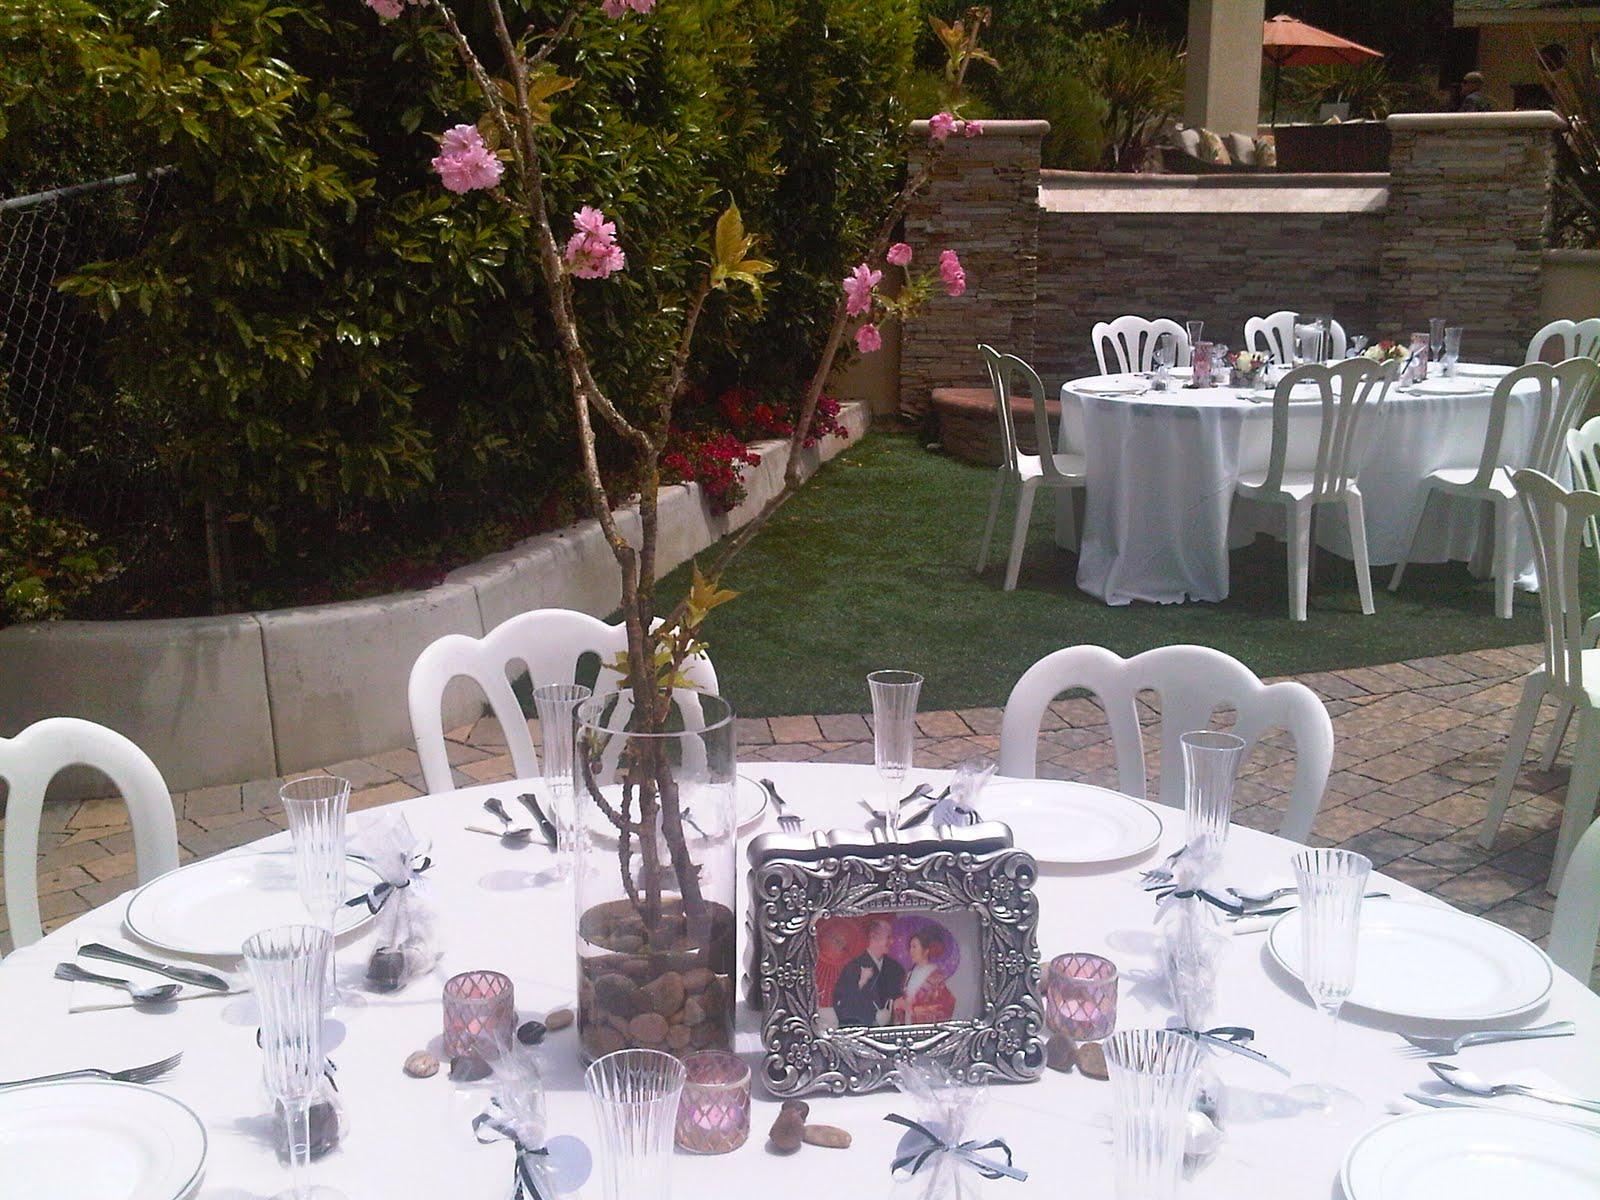 Plumeria Cake Studio: Cherry Blossom Wedding Centerpieces